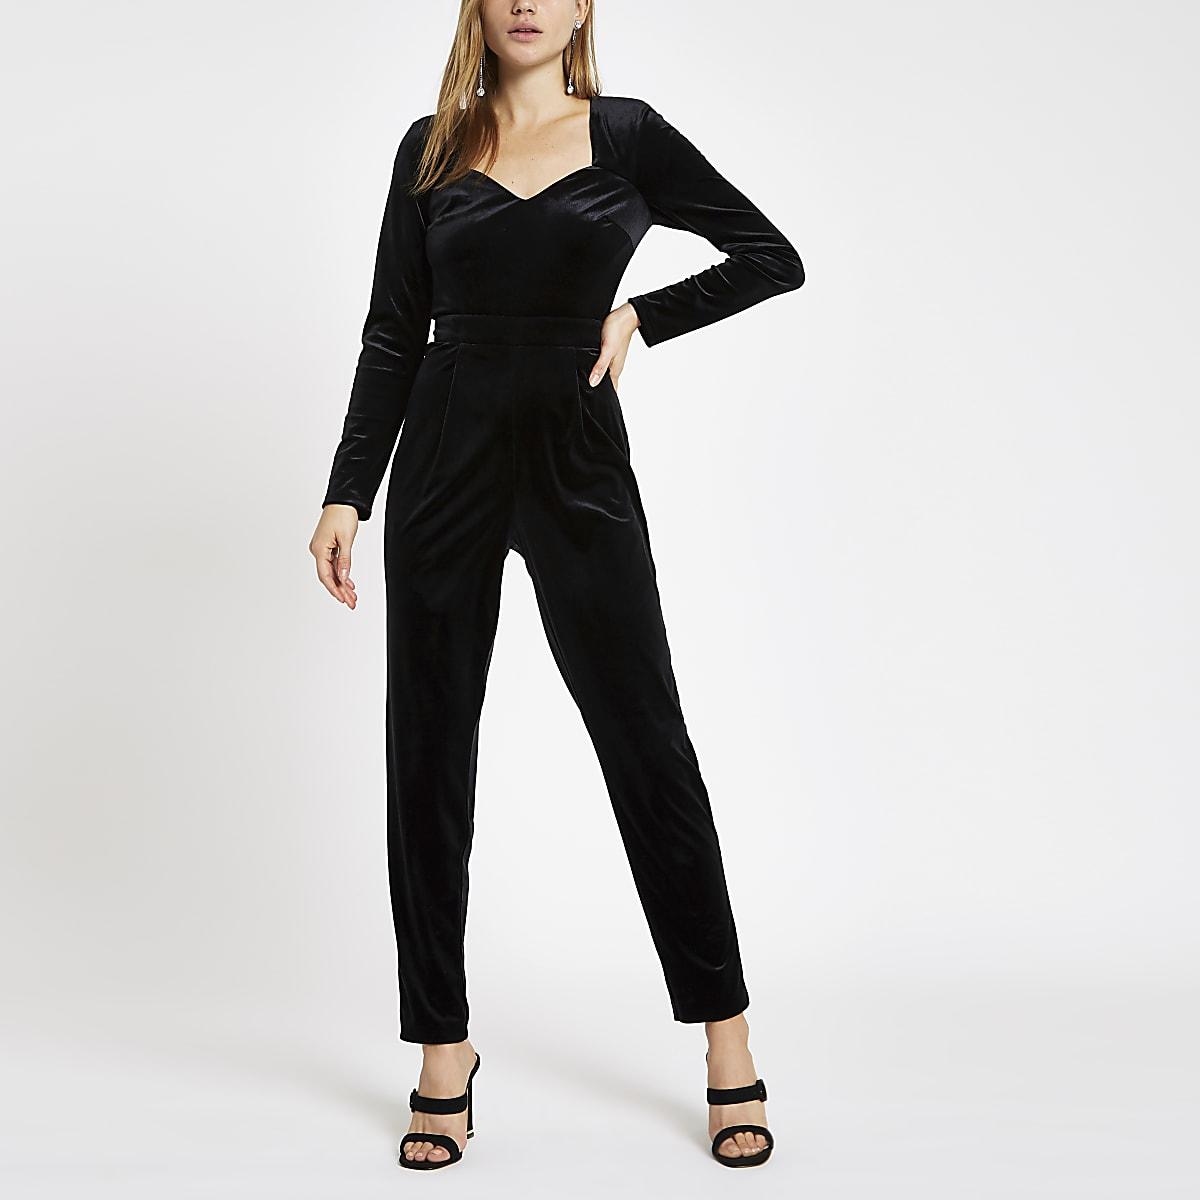 buy sale fashion styles huge inventory Black velvet long sleeve jumpsuit